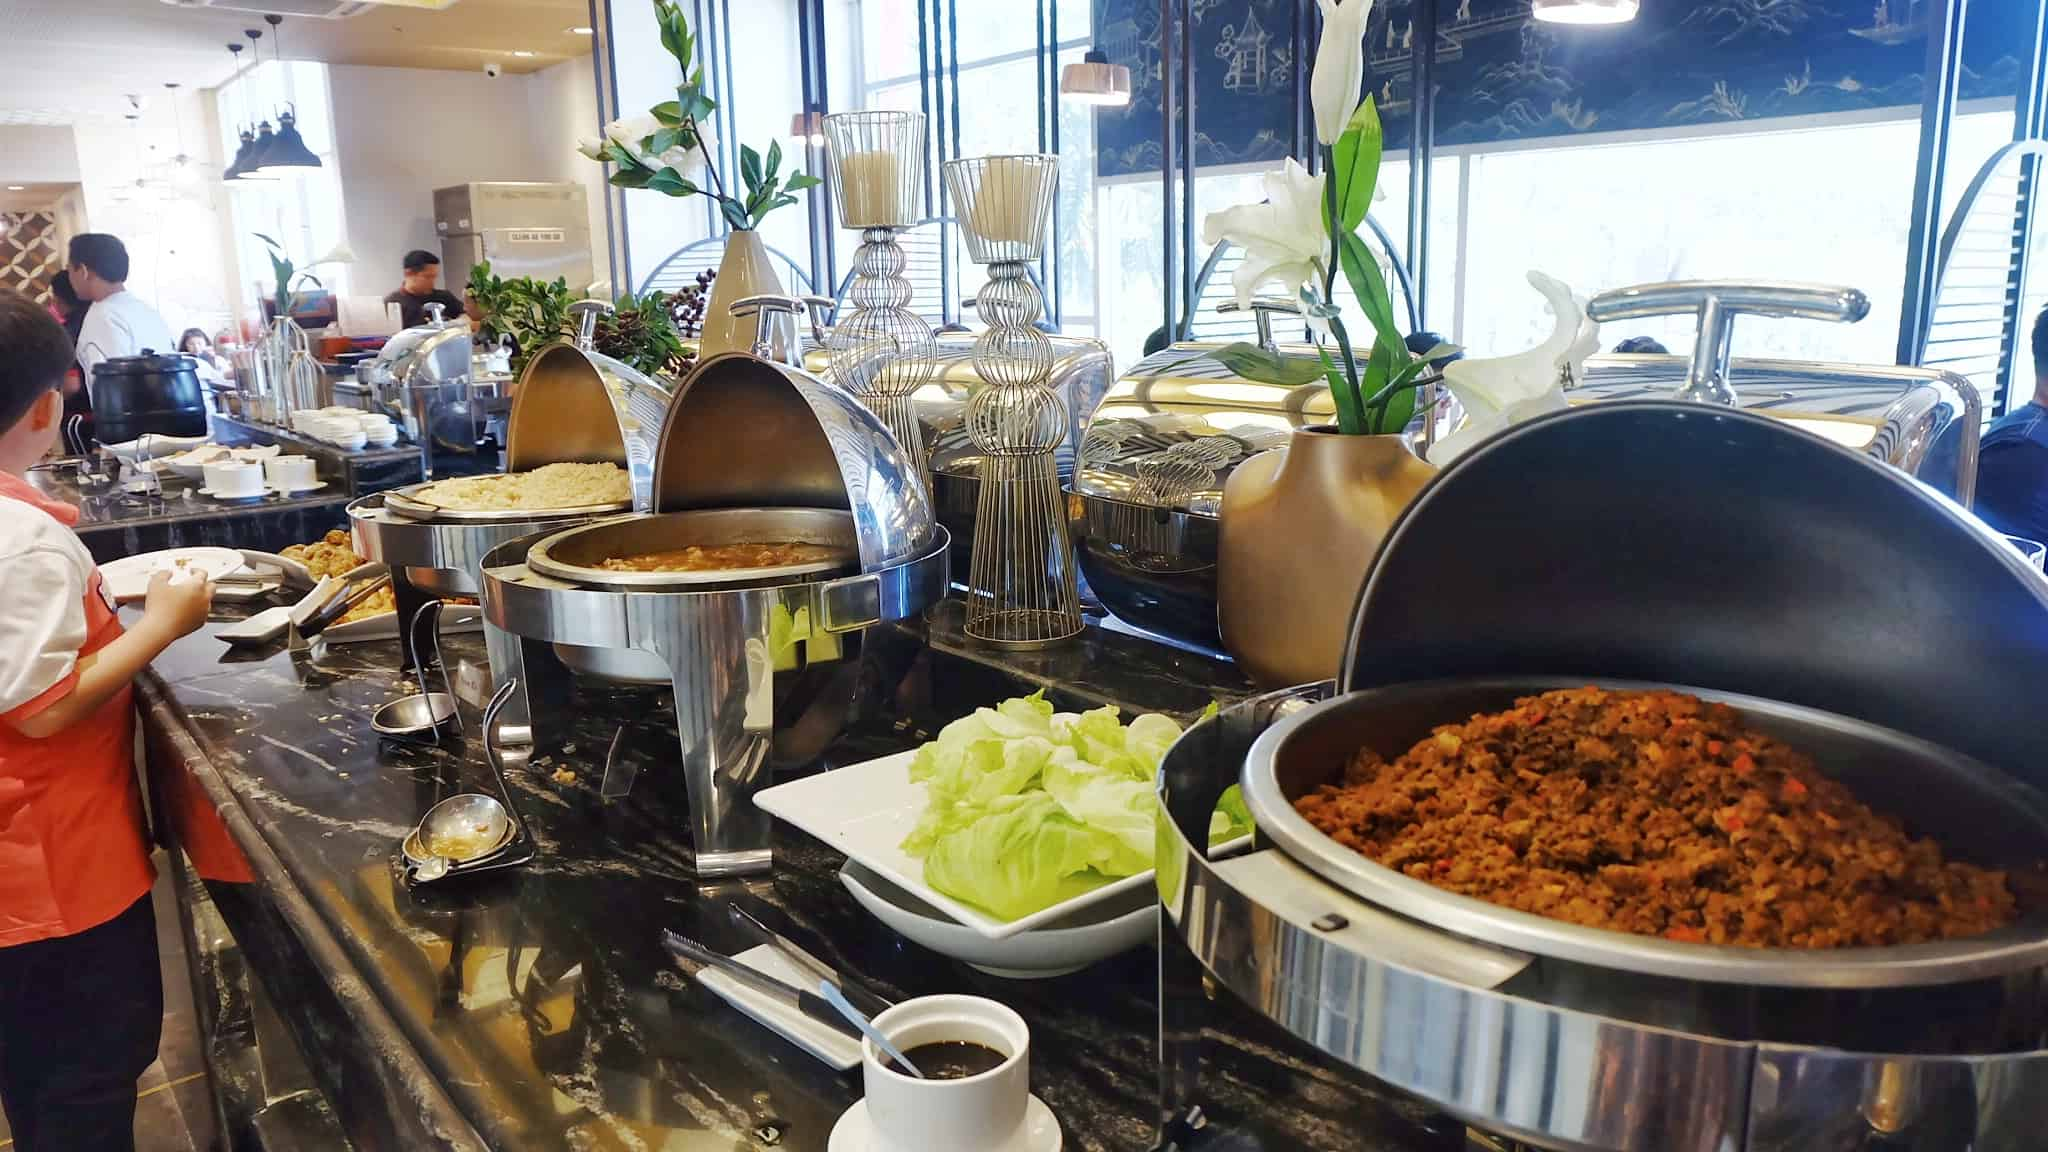 Cebu Eats: Ding Qua Qua, UNLIMITED Dimsum for only ₱328   Sugbo ph